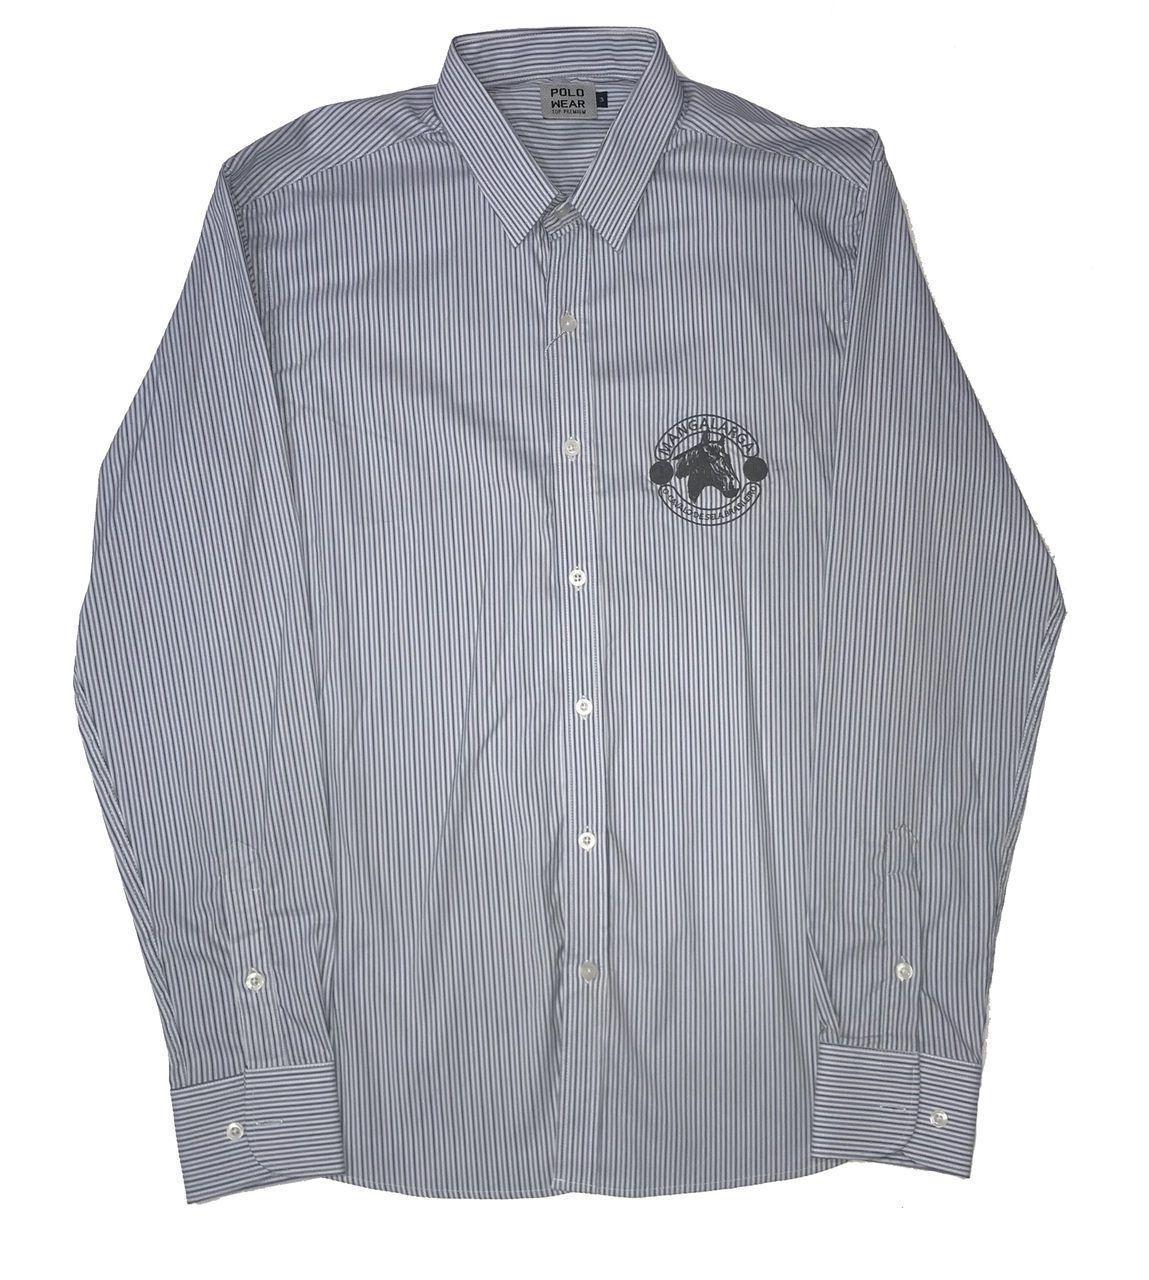 Camisa Top Premium Masculina Listras Cinza e Azul  - Boutique Mangalarga